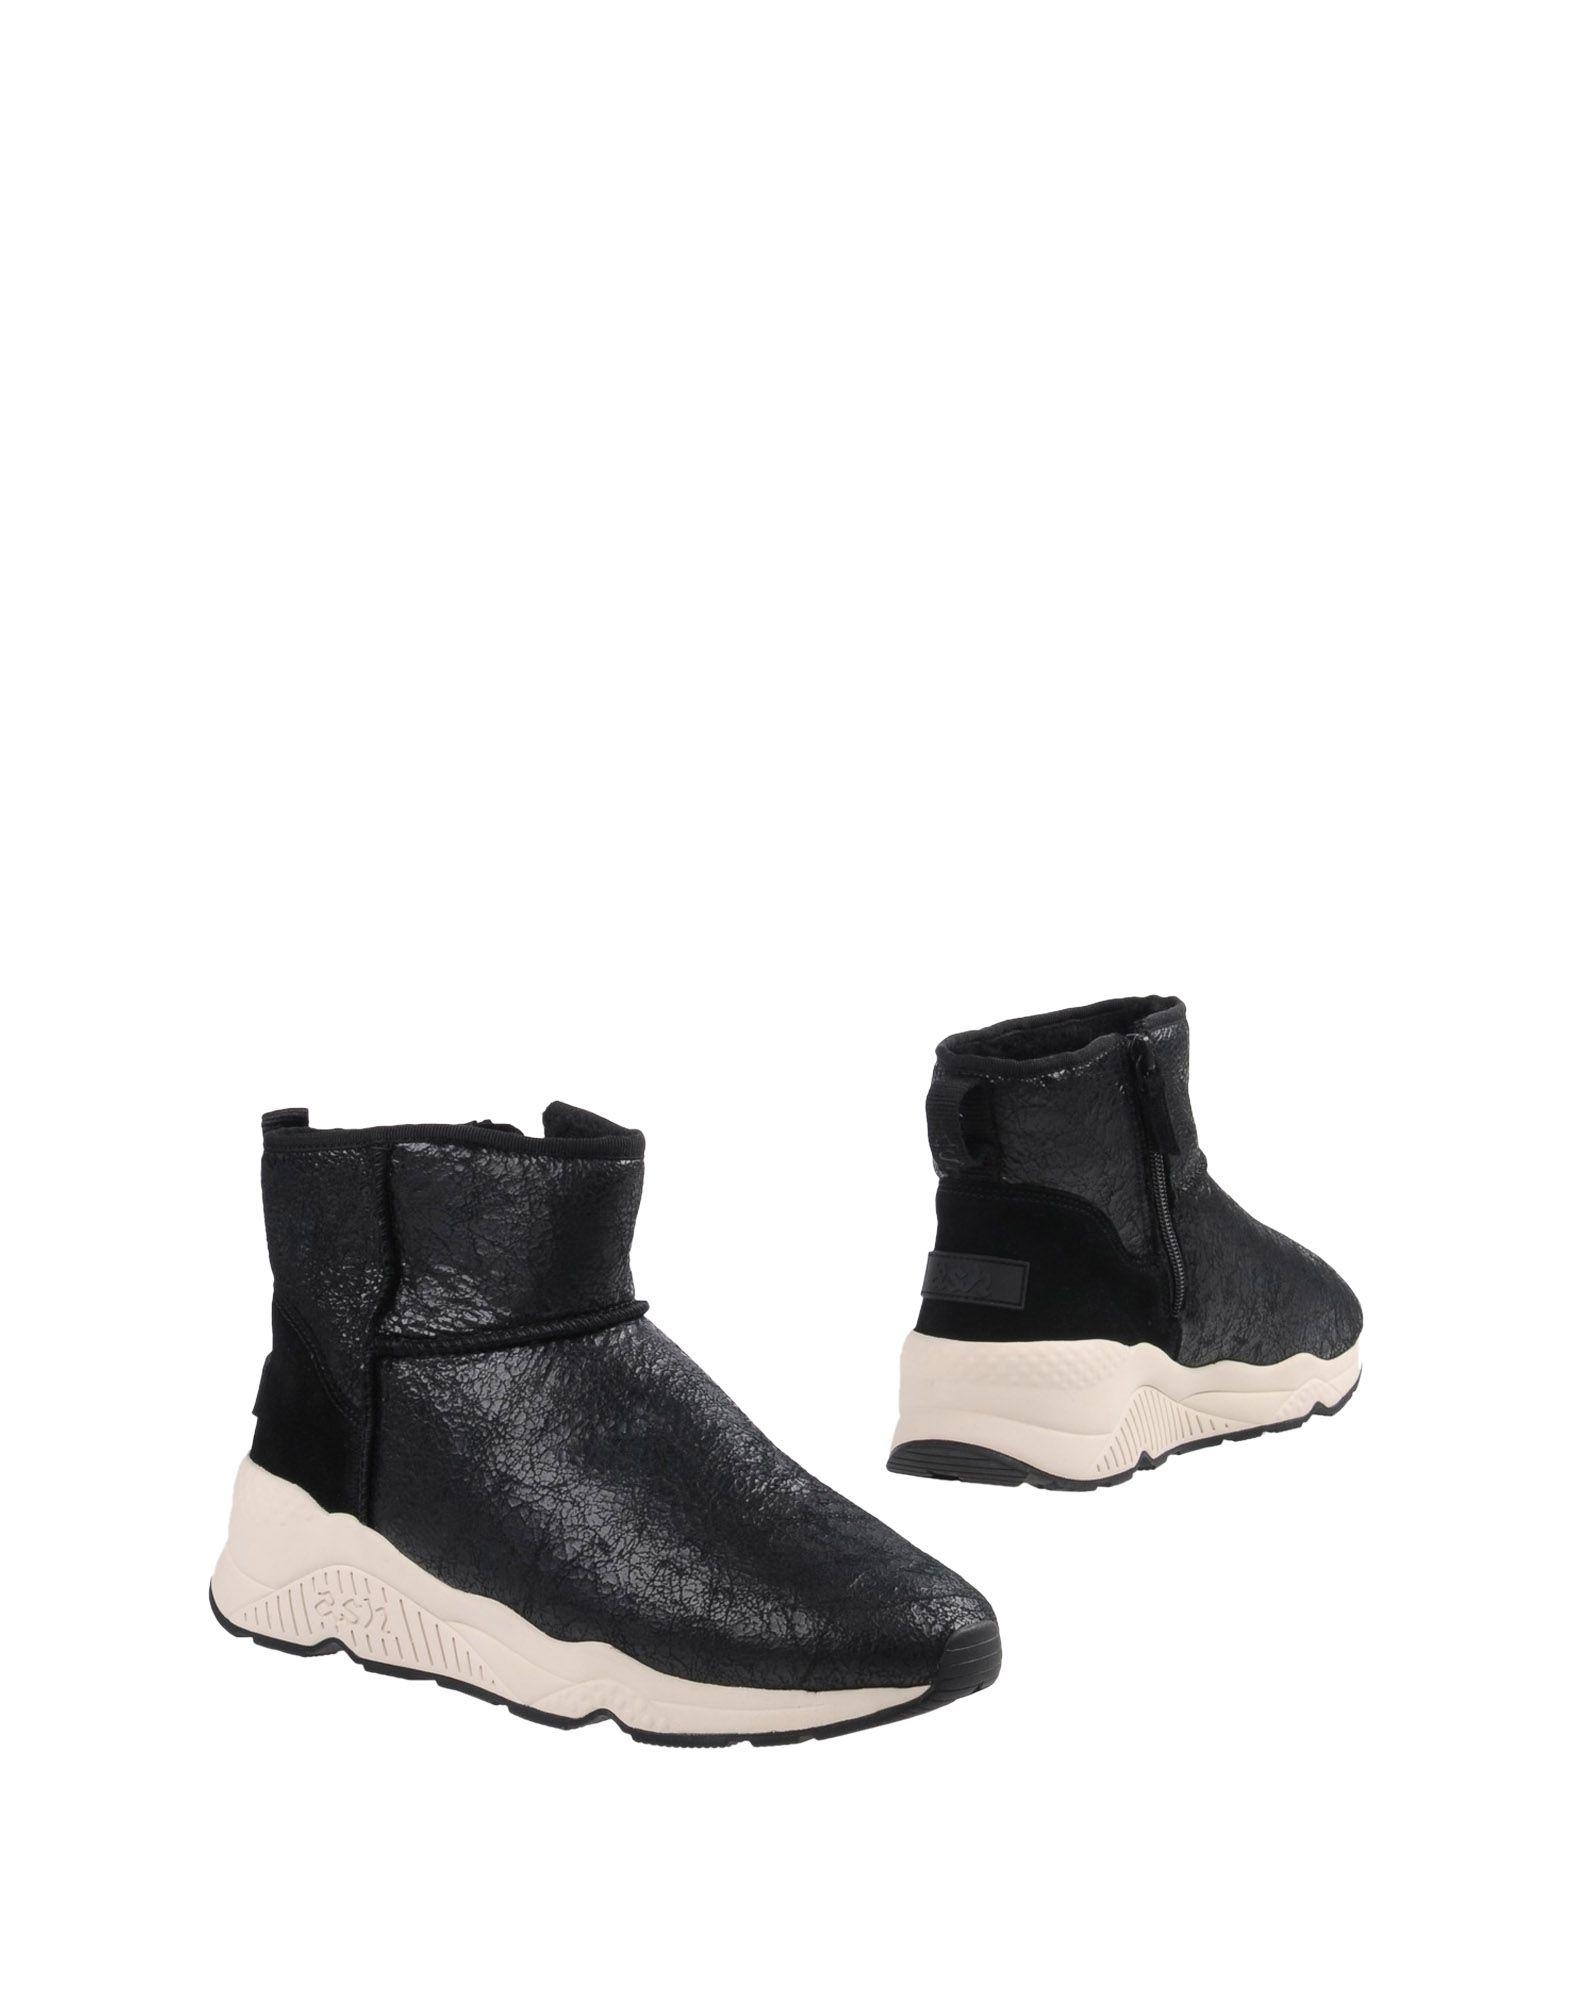 Stilvolle billige Stiefelette Schuhe Ash Stiefelette billige Damen  11339575PP 03d58b